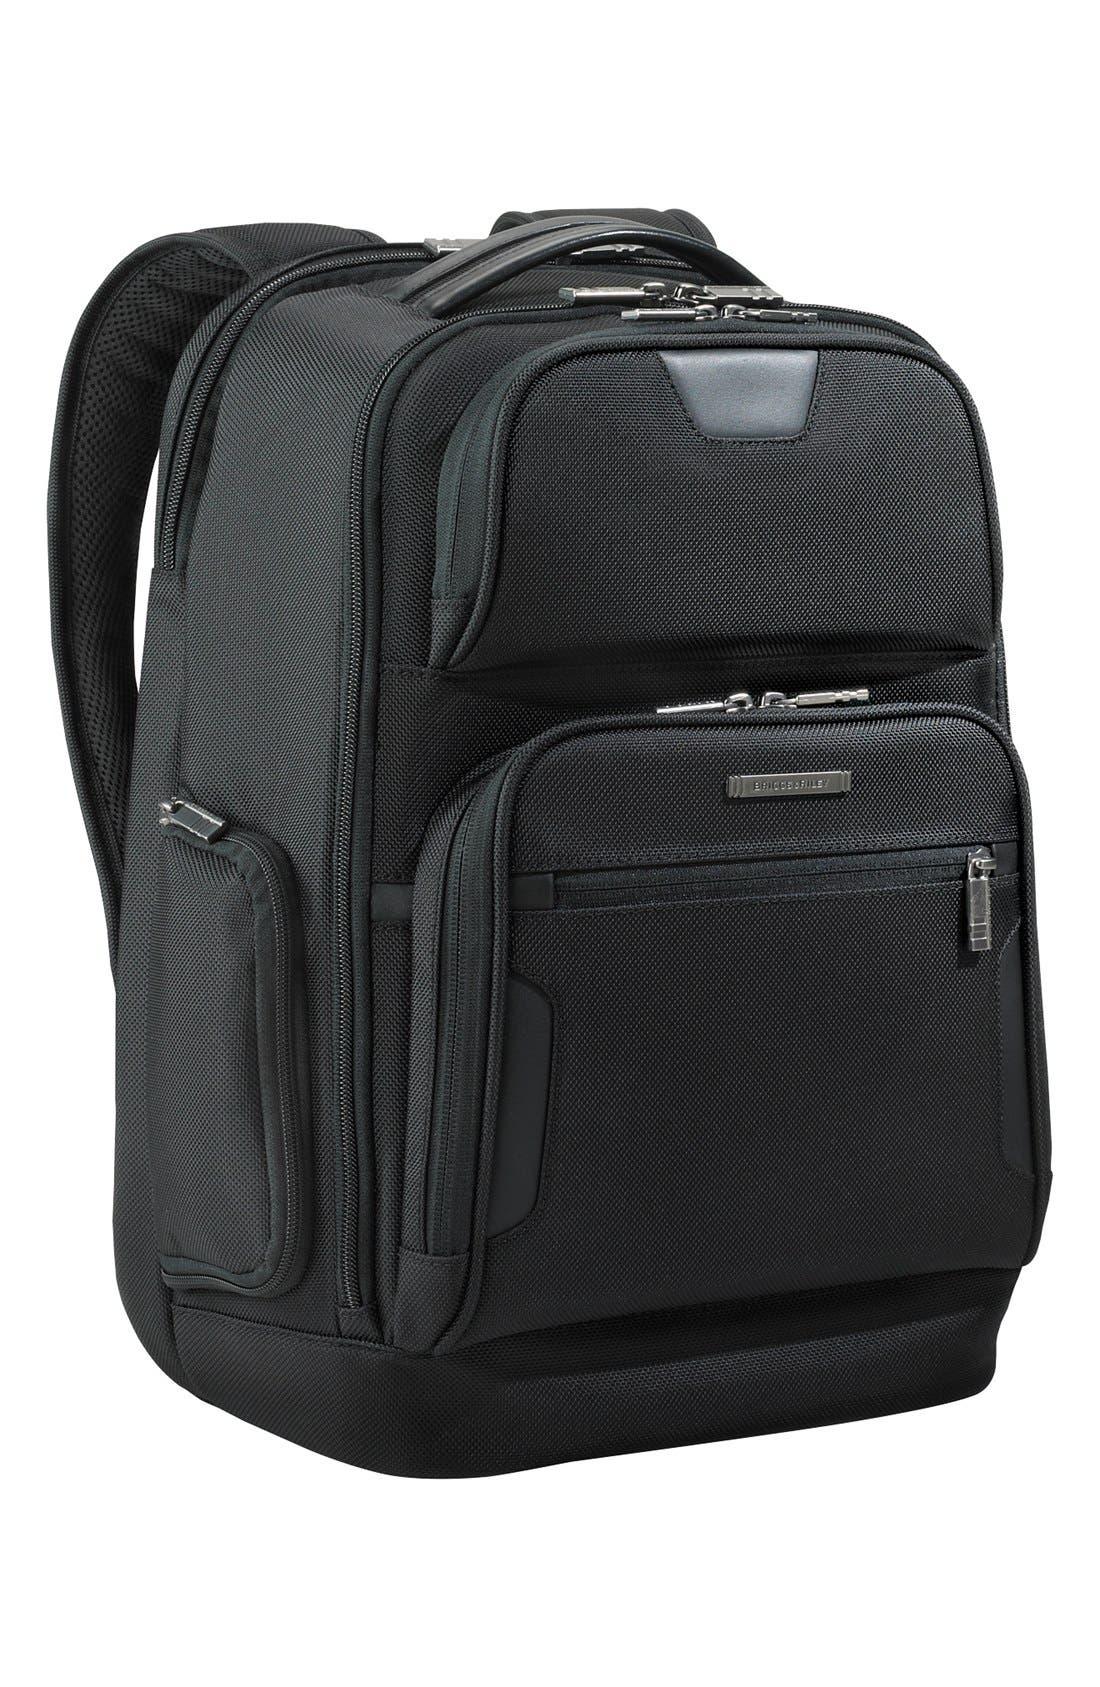 BRIGGS & RILEY Medium Ballistic Nylon Backpack